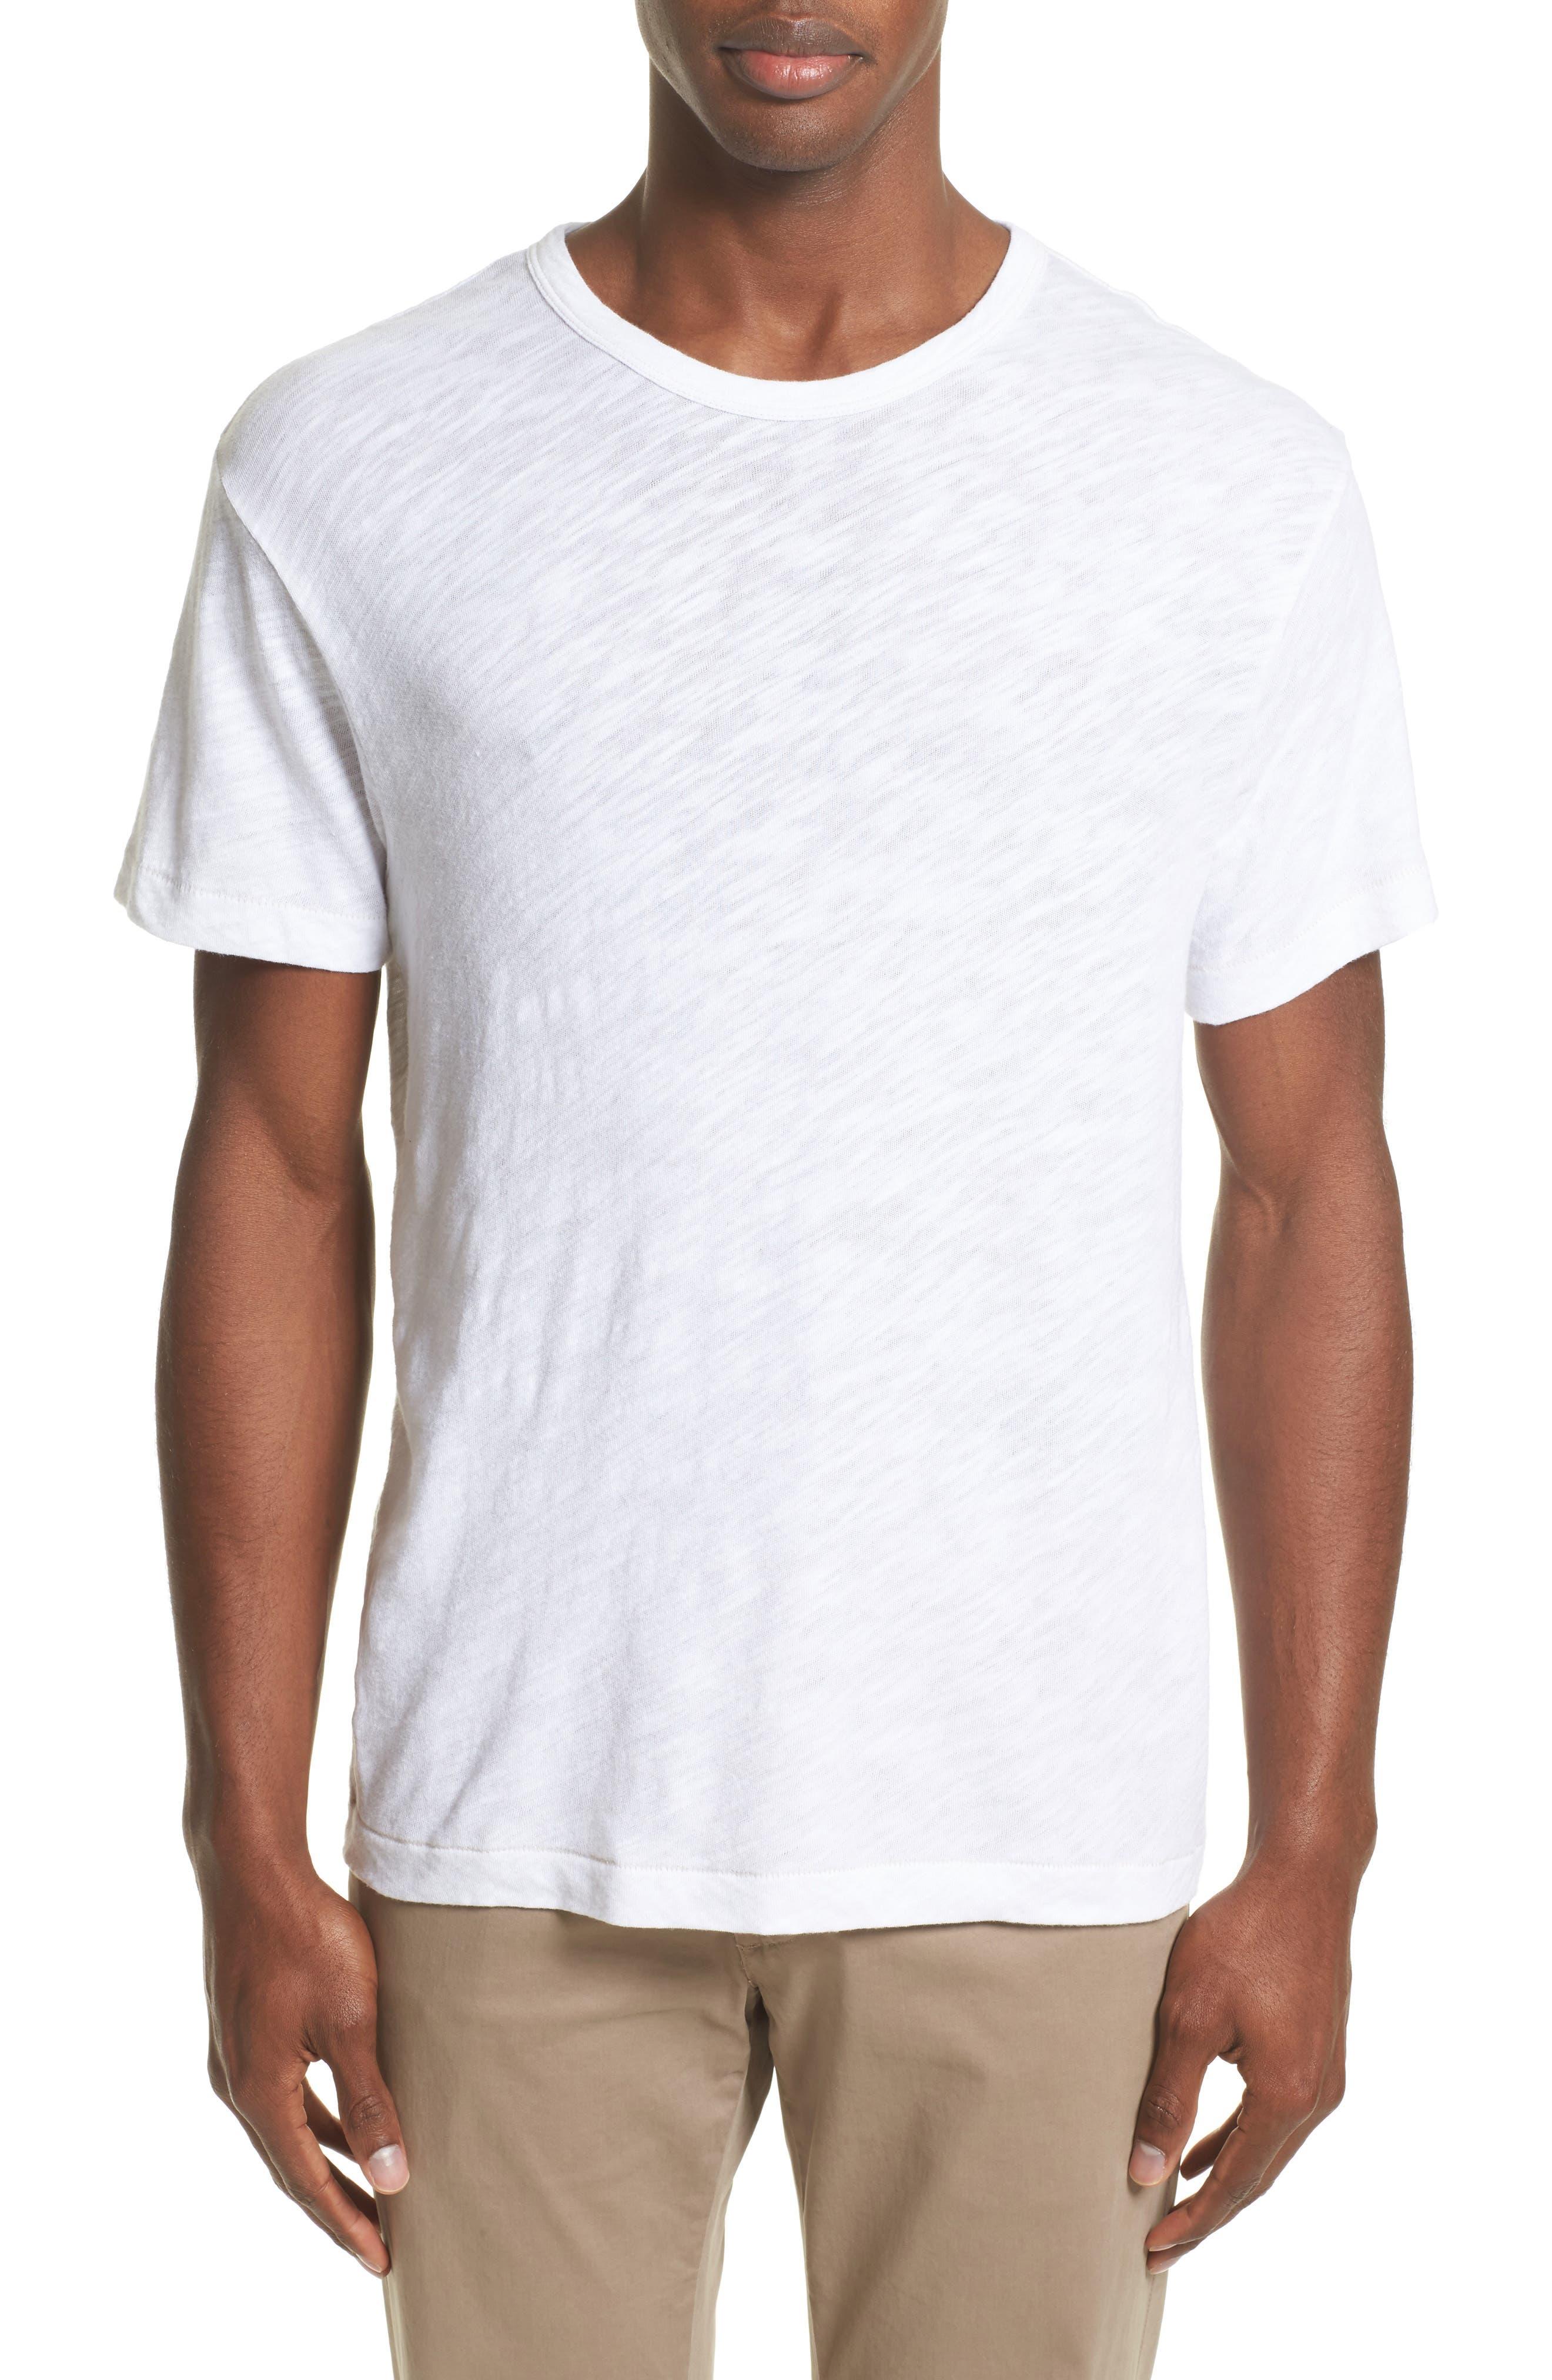 Main Image - Todd Snyder + Champion Crewneck T-Shirt